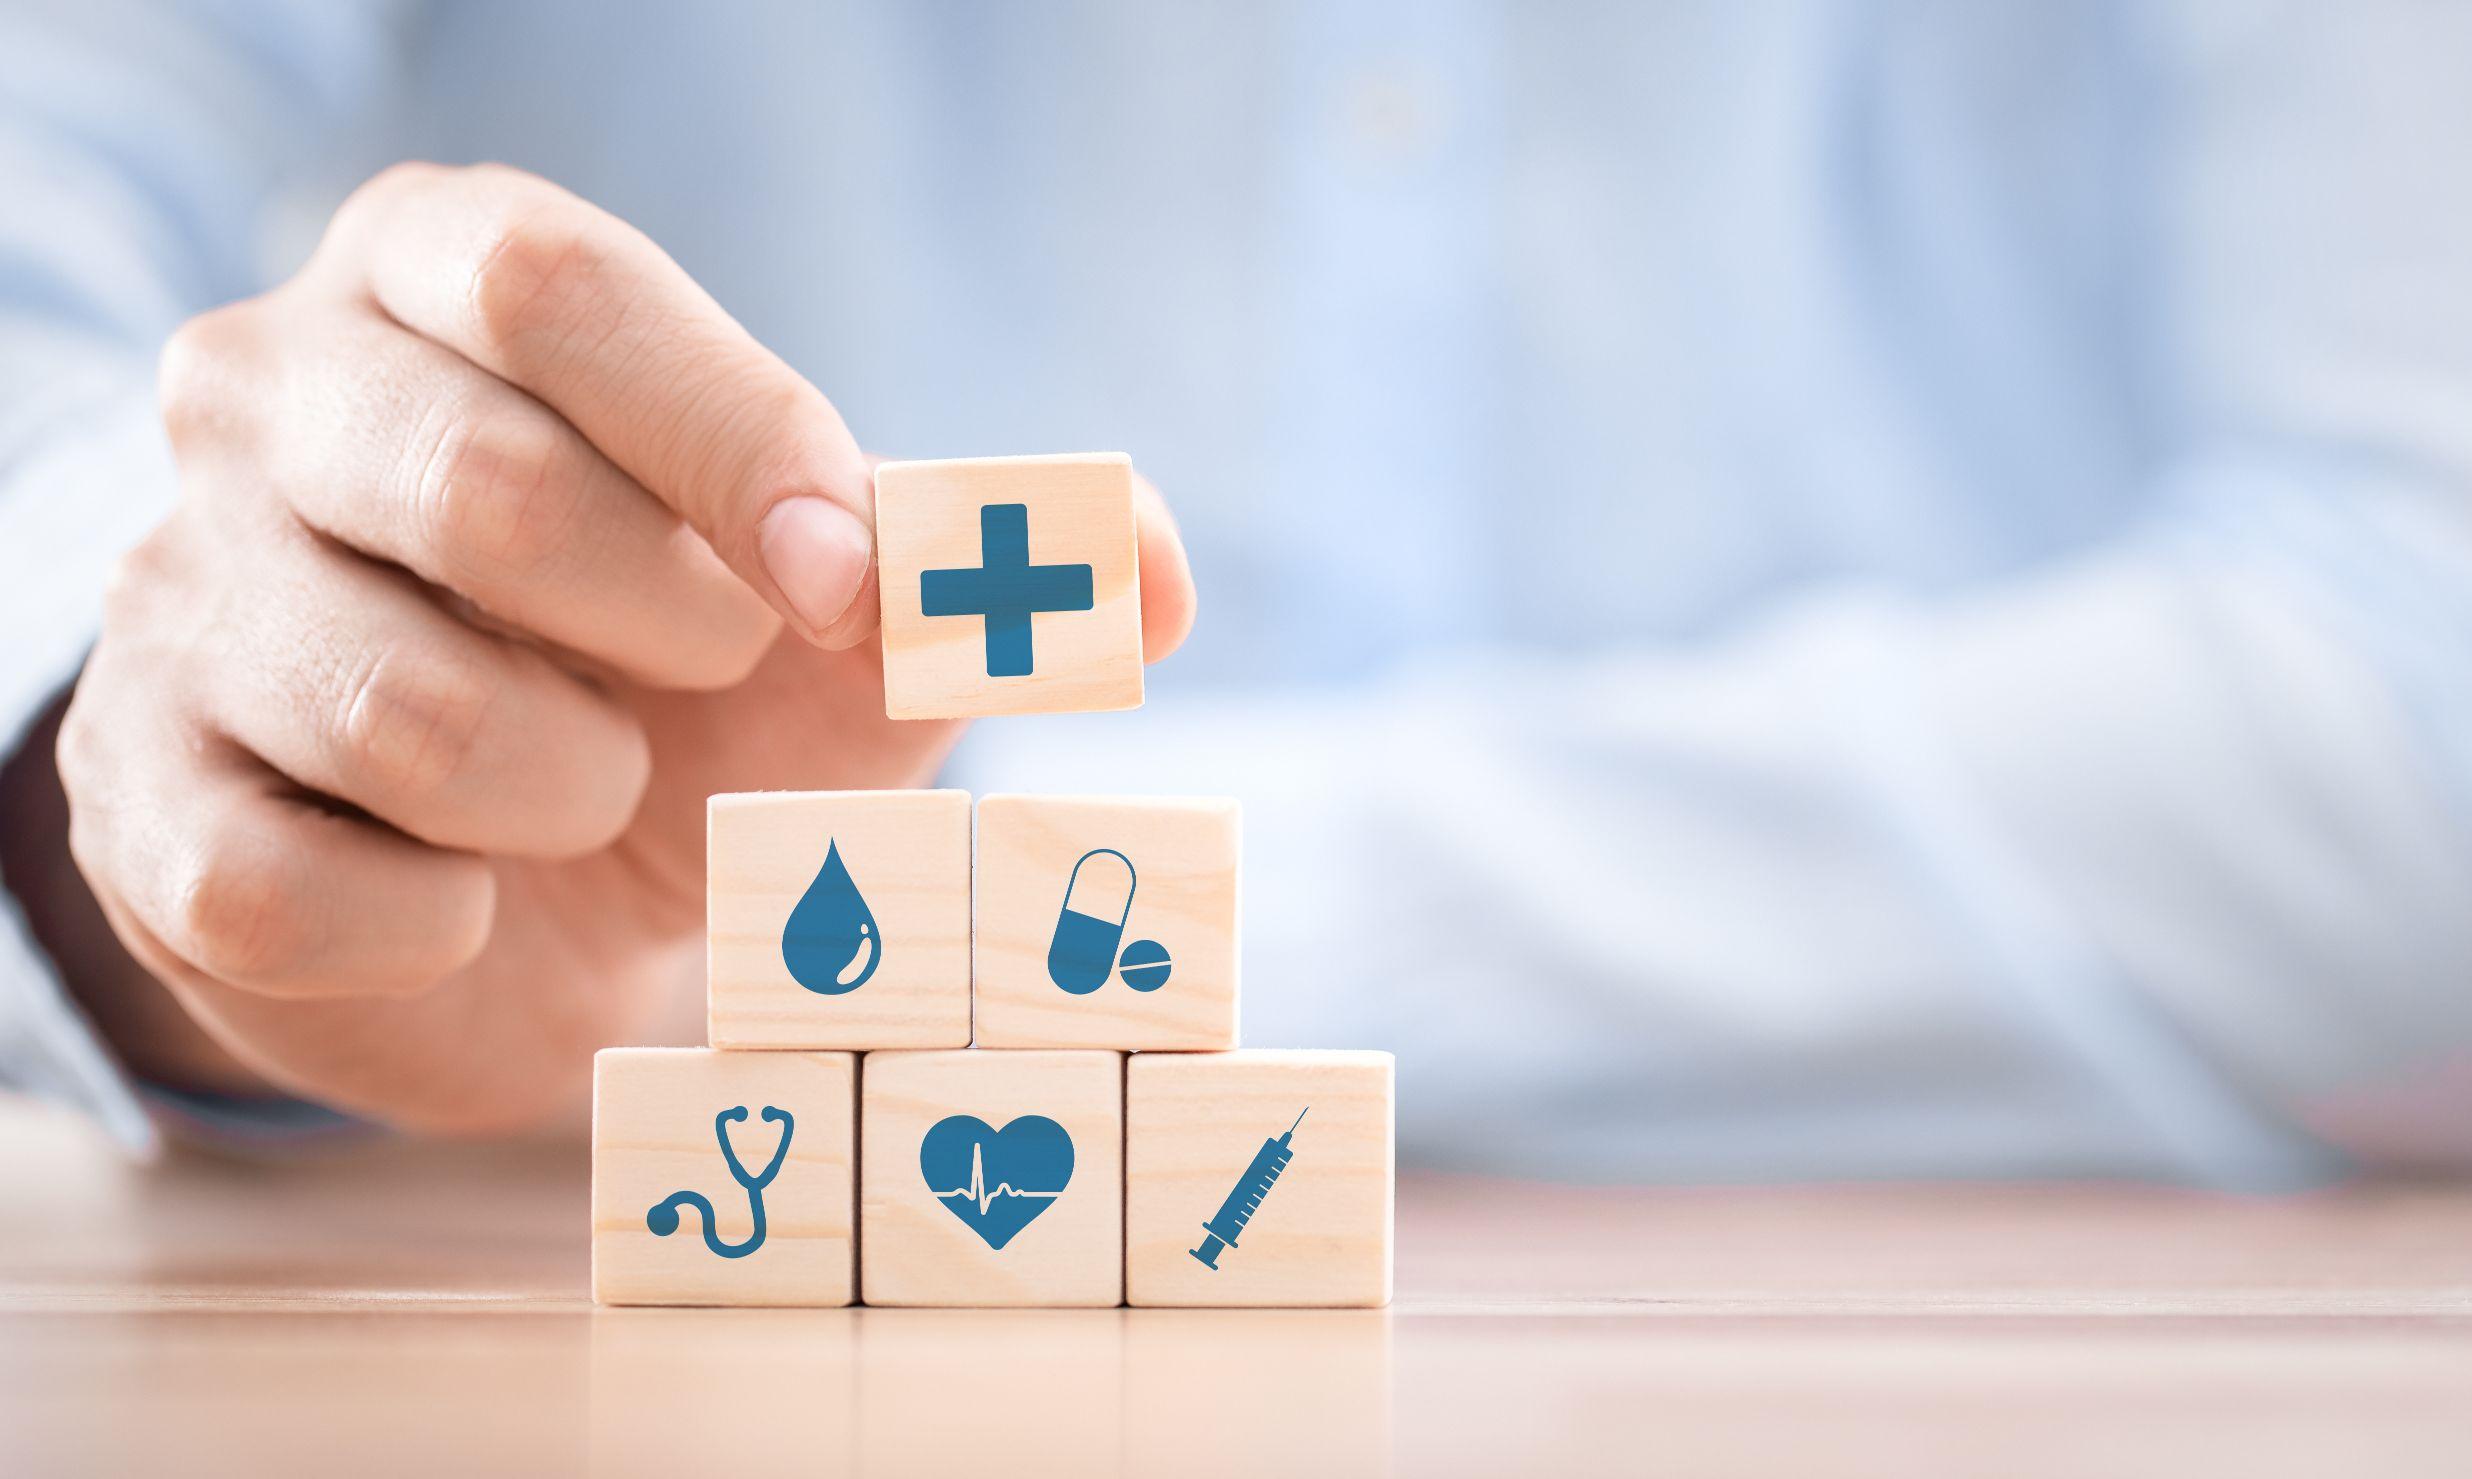 assurance medicaments privee quebec fonctionnement